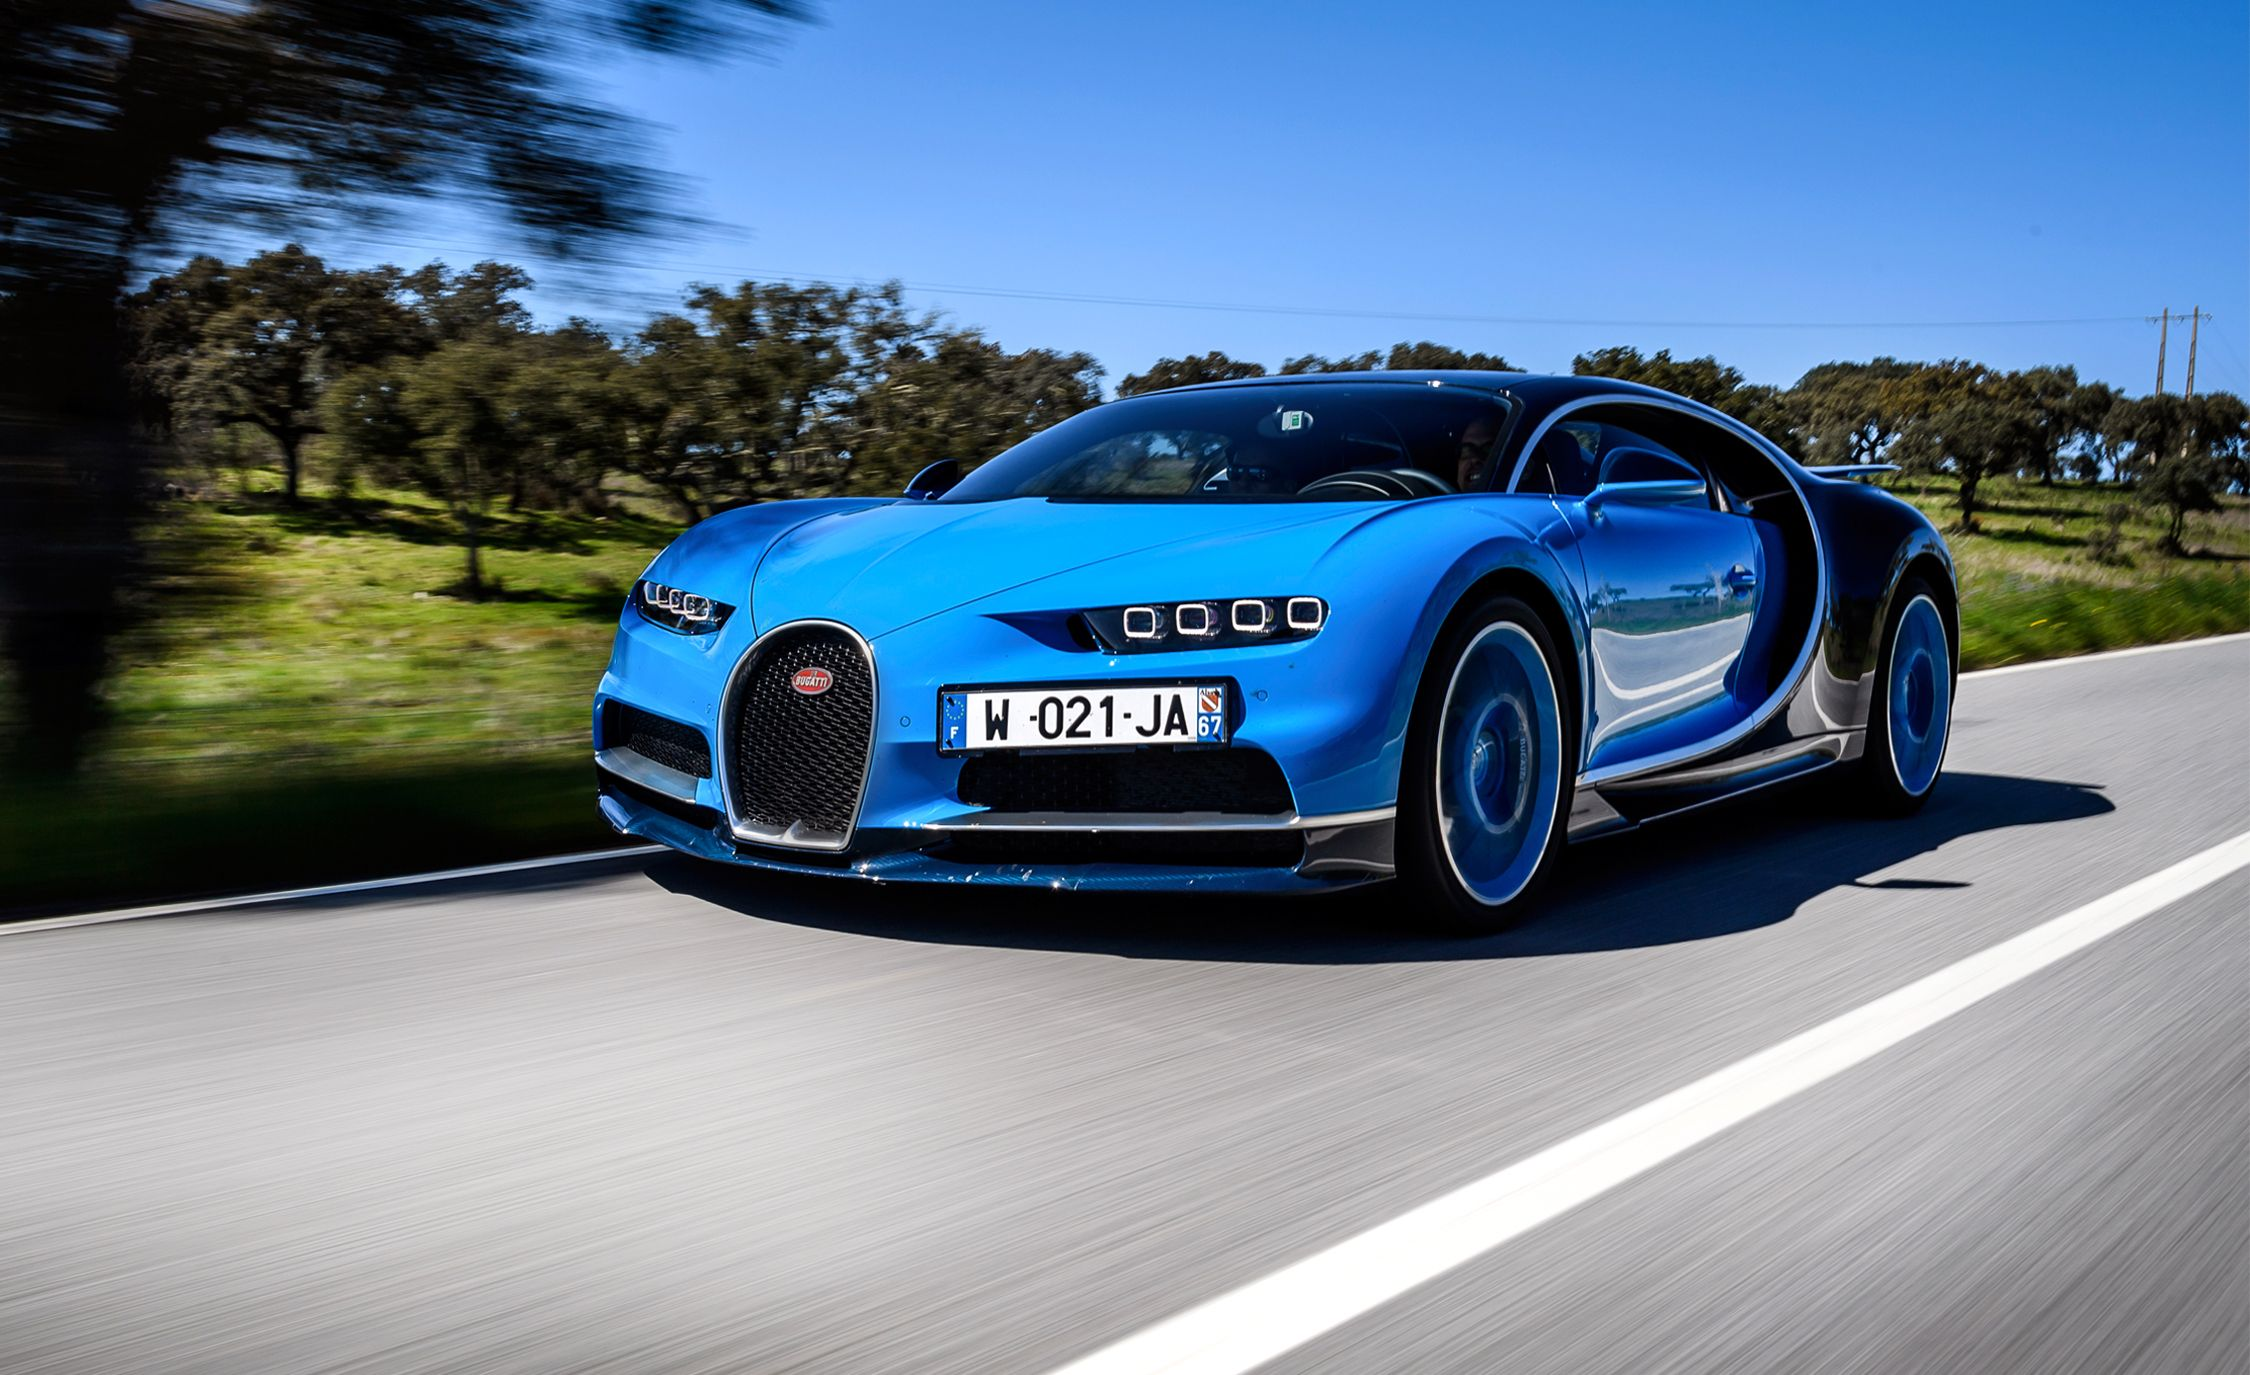 Images of a bugatti